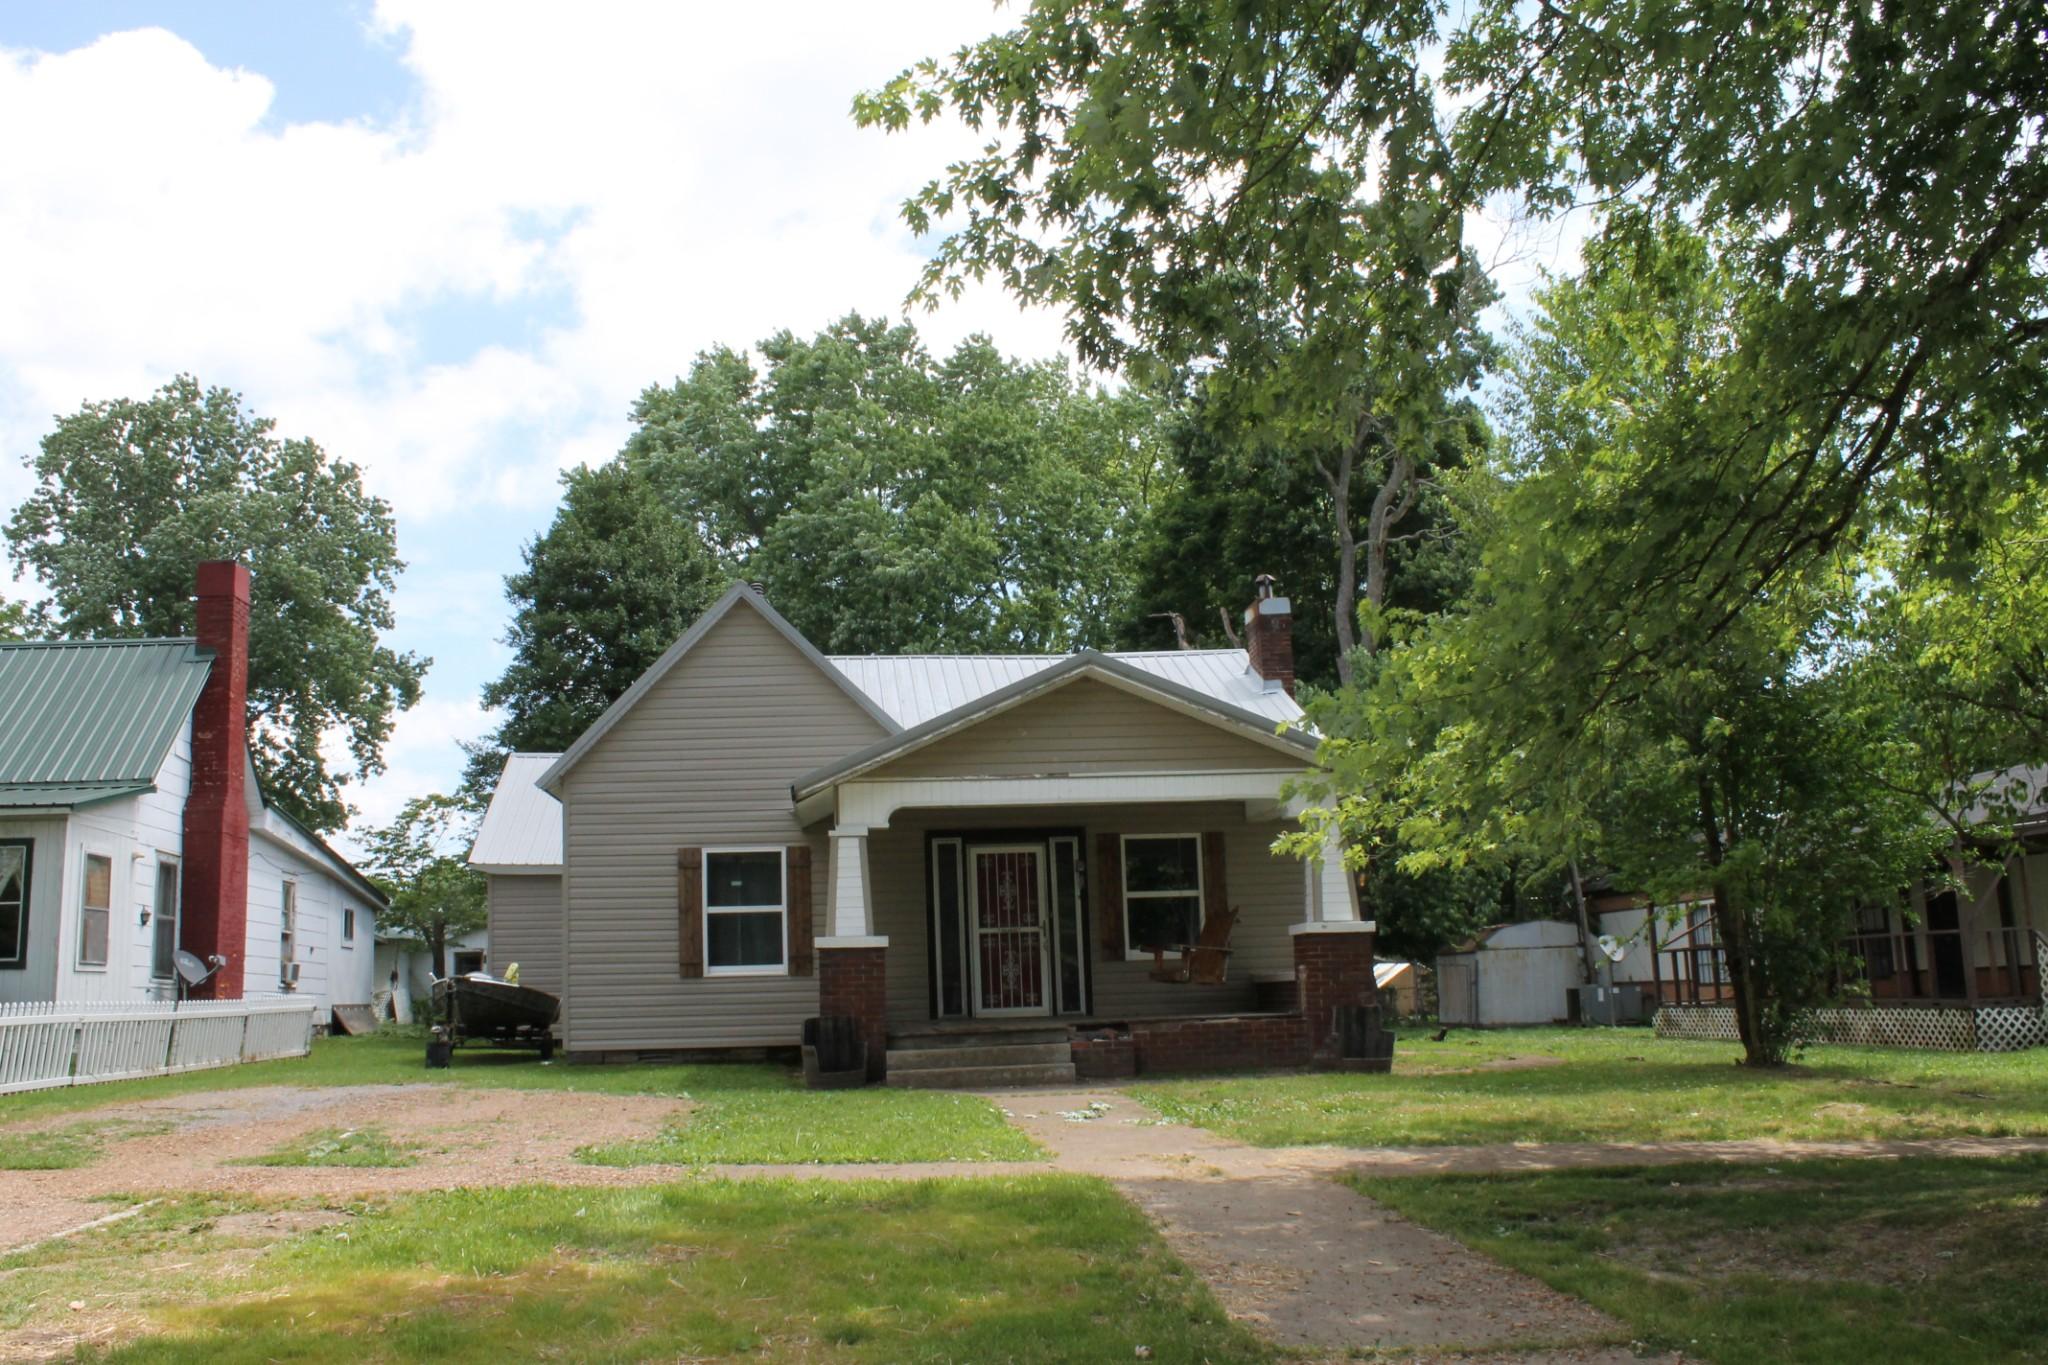 215 S Washington St Property Photo - Tullahoma, TN real estate listing